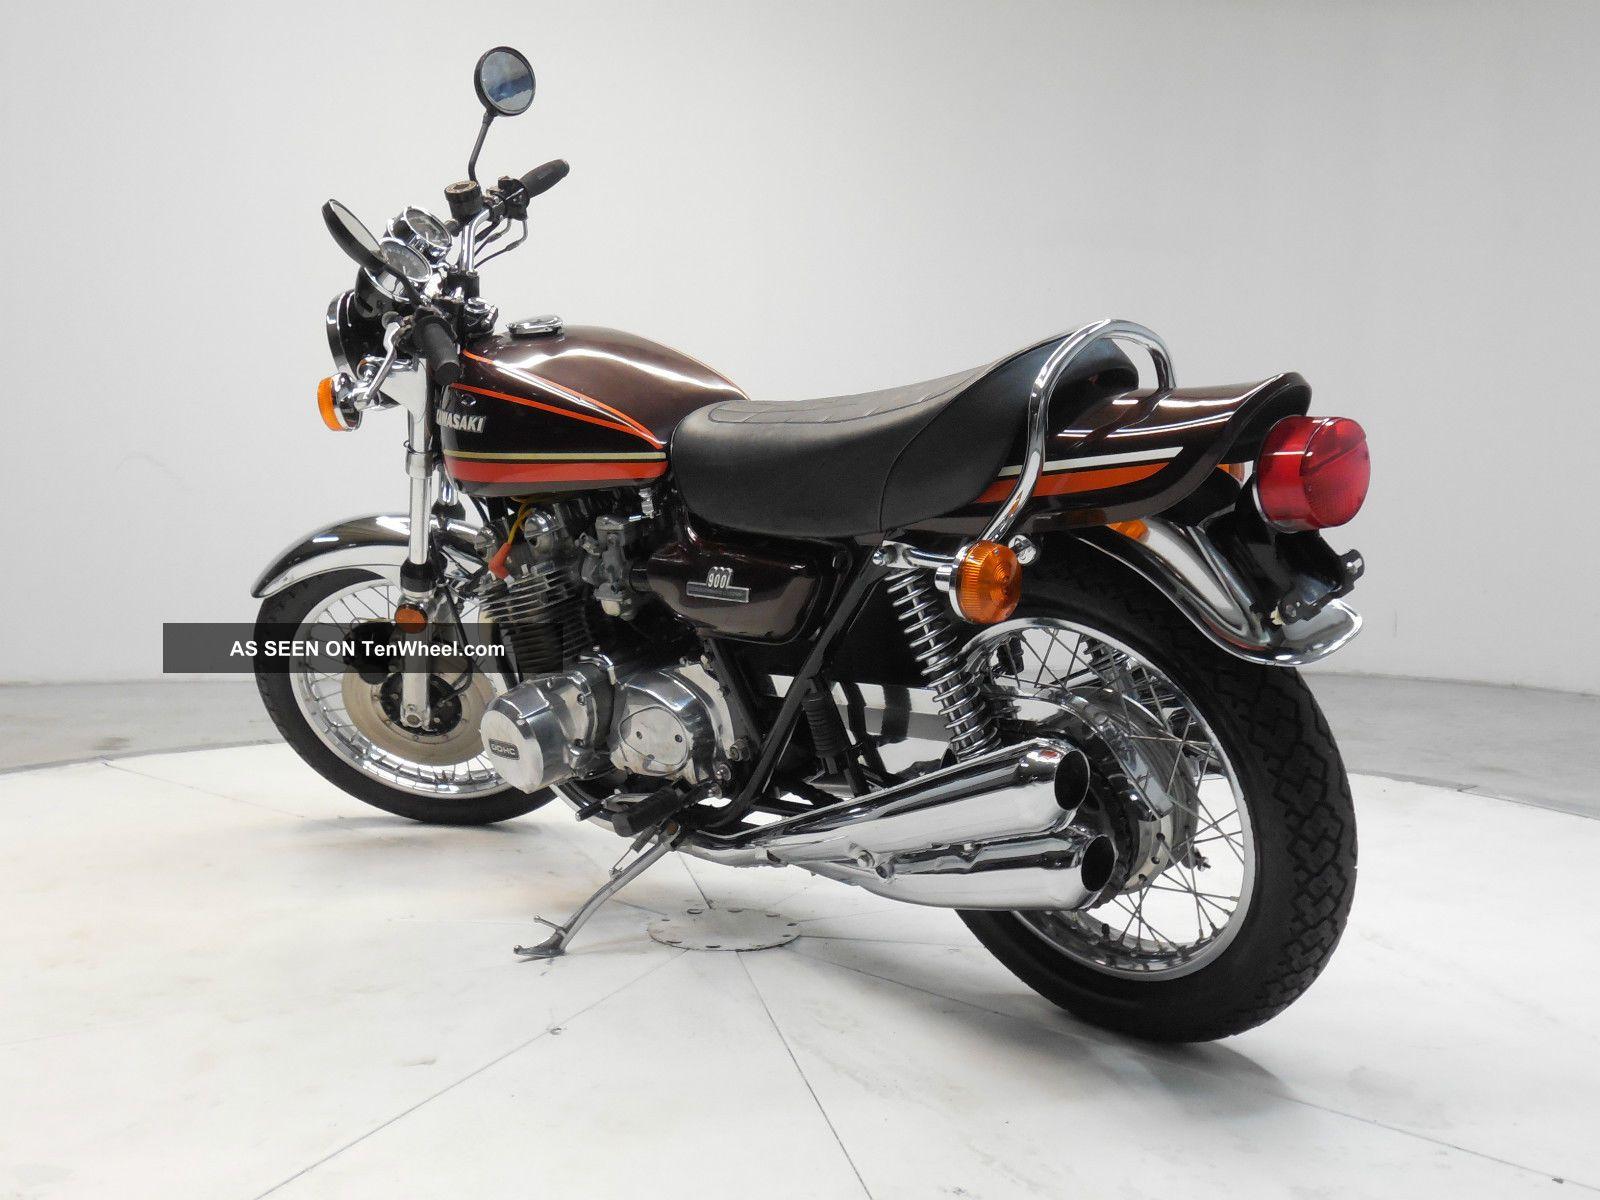 1975 Kawasaki Z1 900 Vintage Motorcycle Condition Eye Catcher